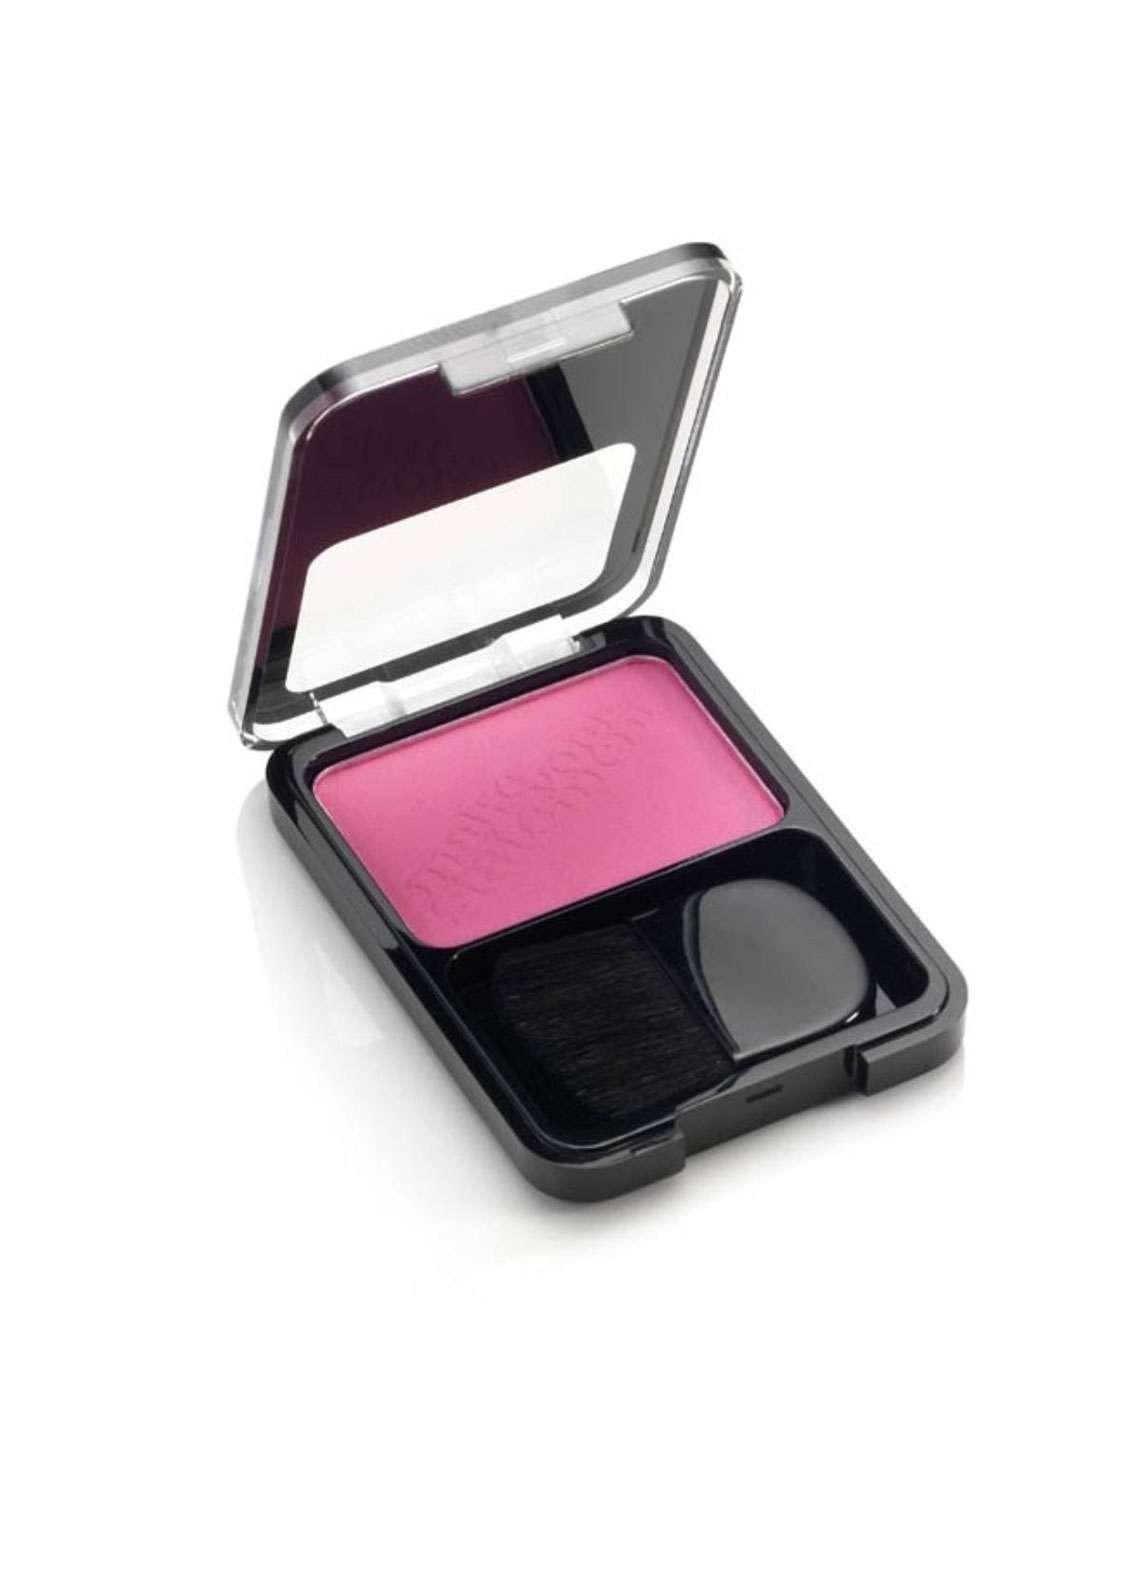 Beauty UK Blush & Brush - 5 Capital Pink